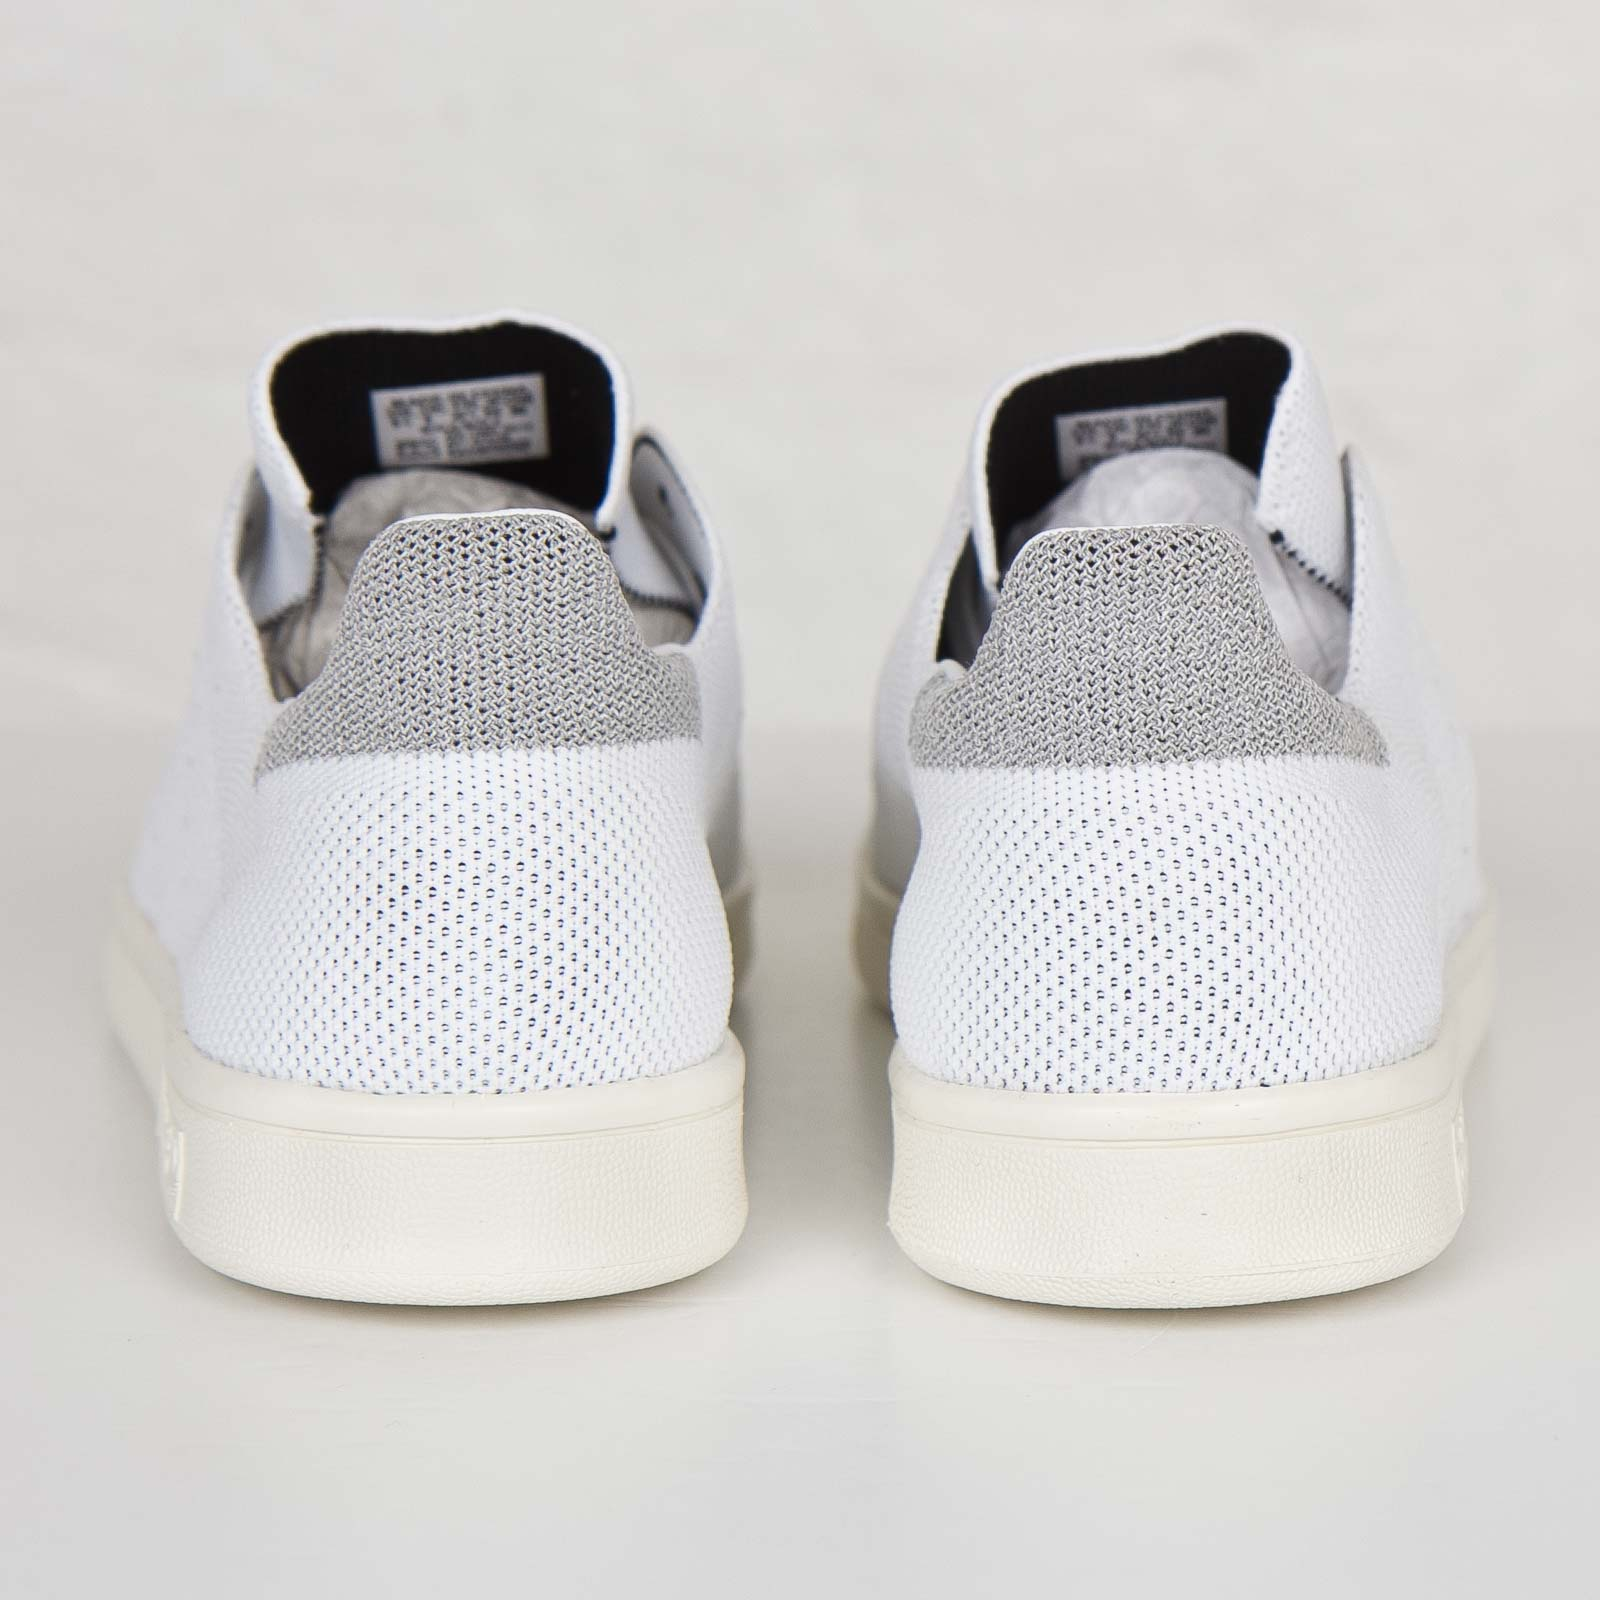 huge discount 527e4 ed921 adidas stan smith primeknit size guide